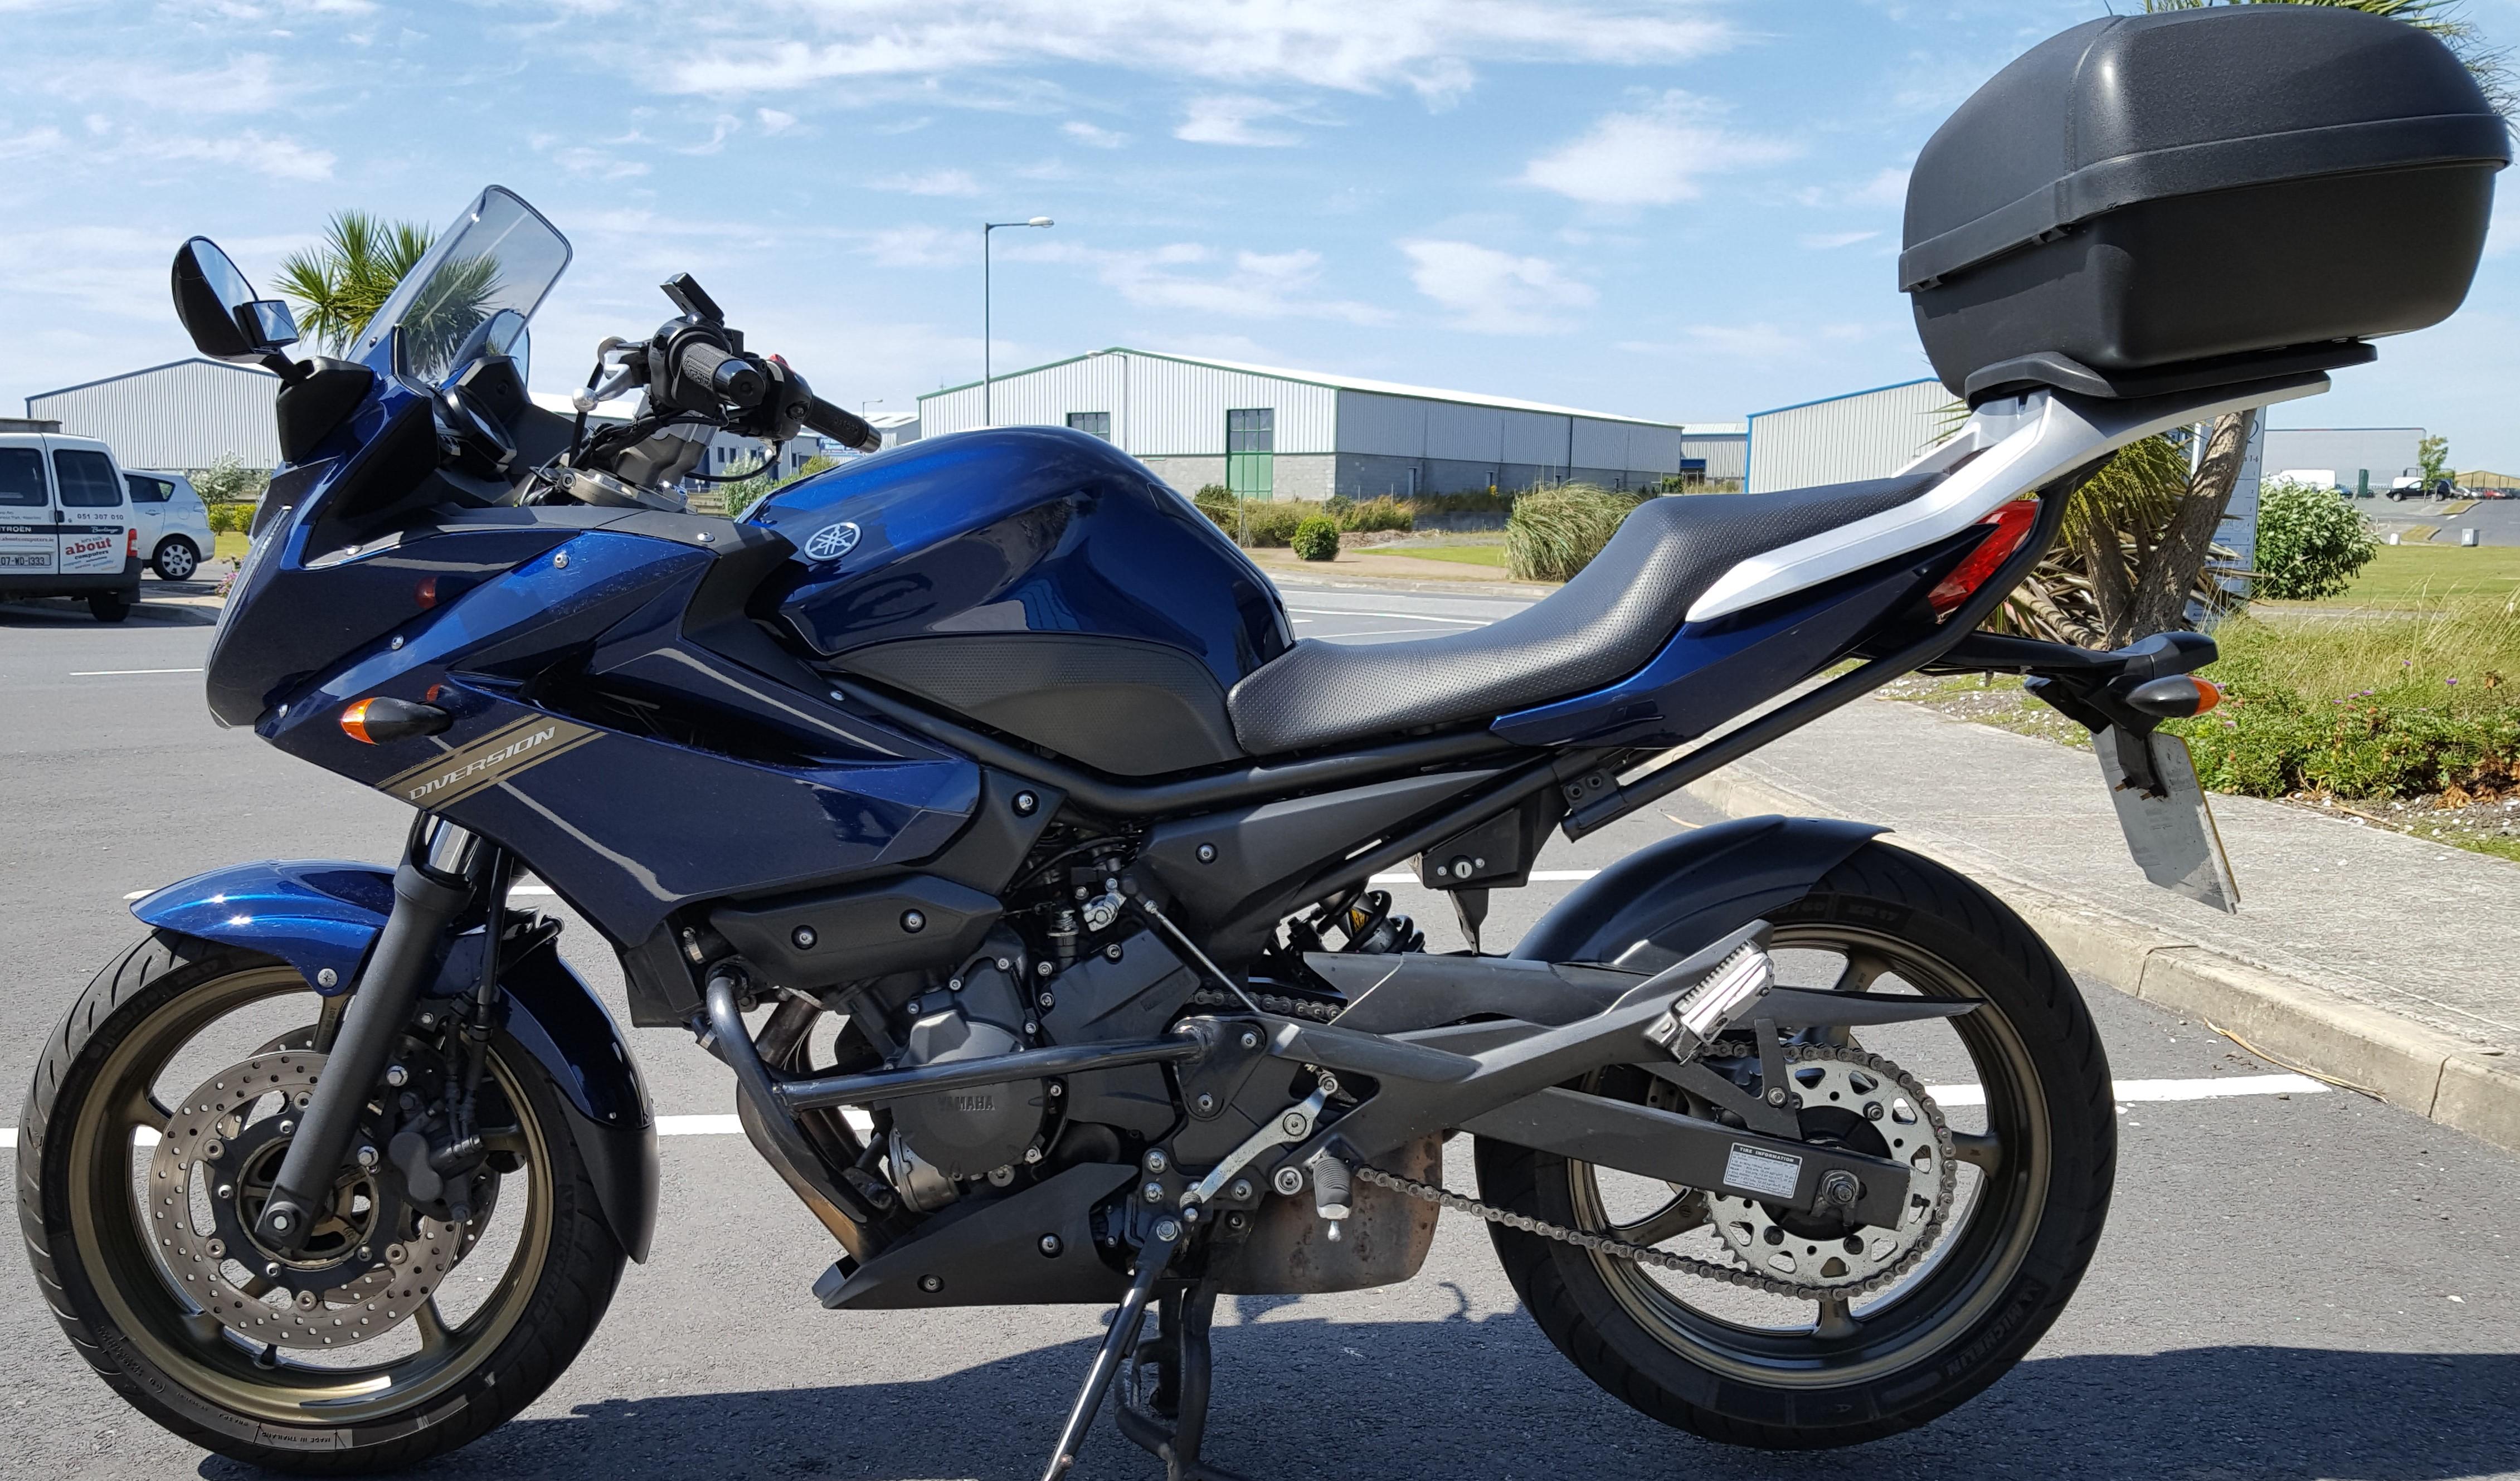 2010 Yamaha XJ6 Diversion